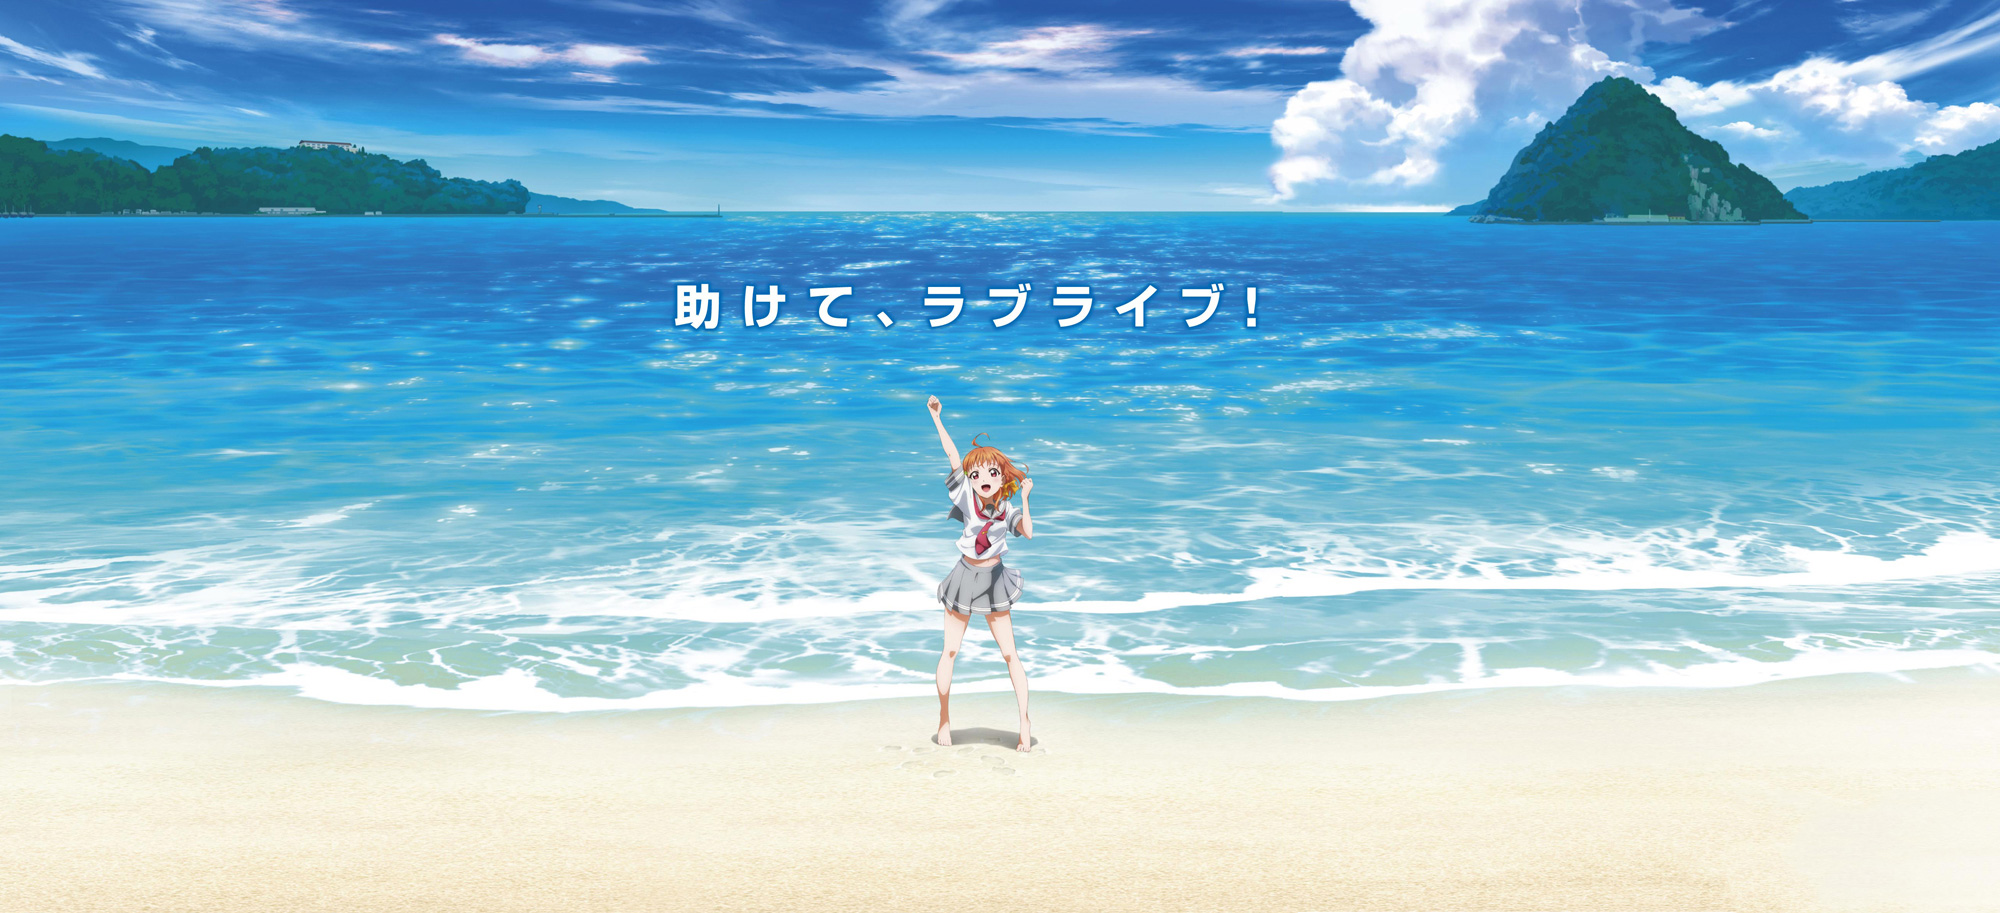 Love-Live!-Sunshine-Announcement-Image